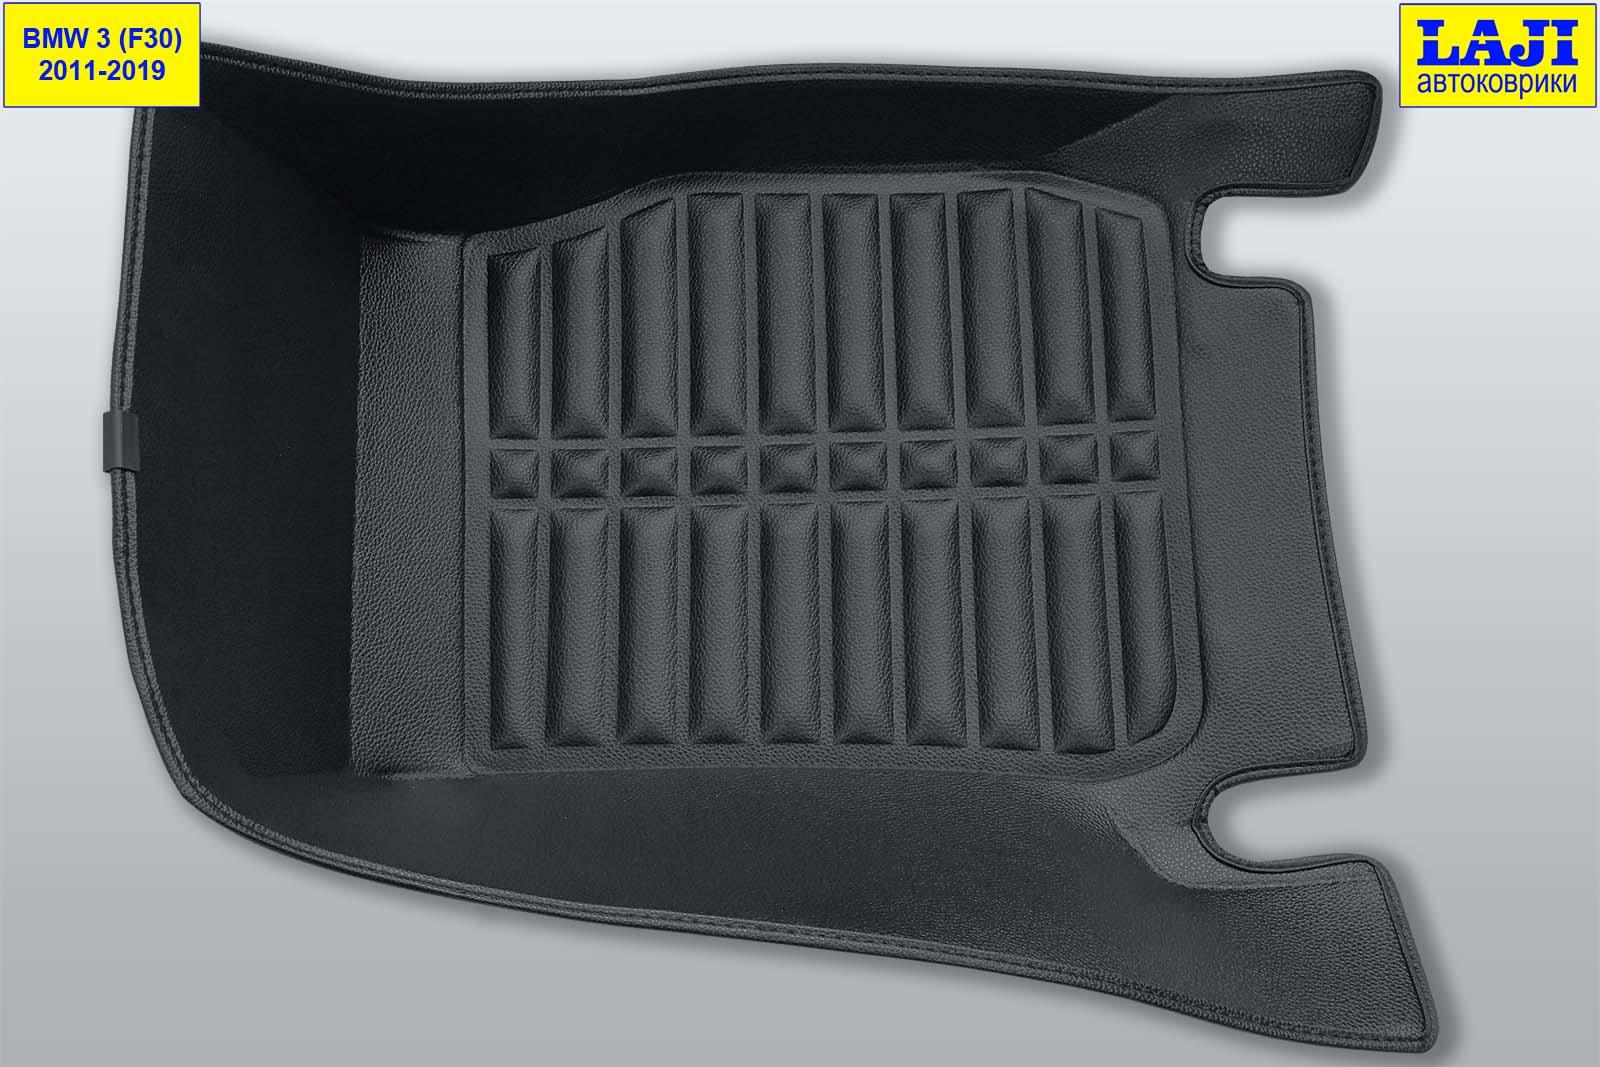 5D коврики в салон BMW 3 серии F30 2011-2018 5